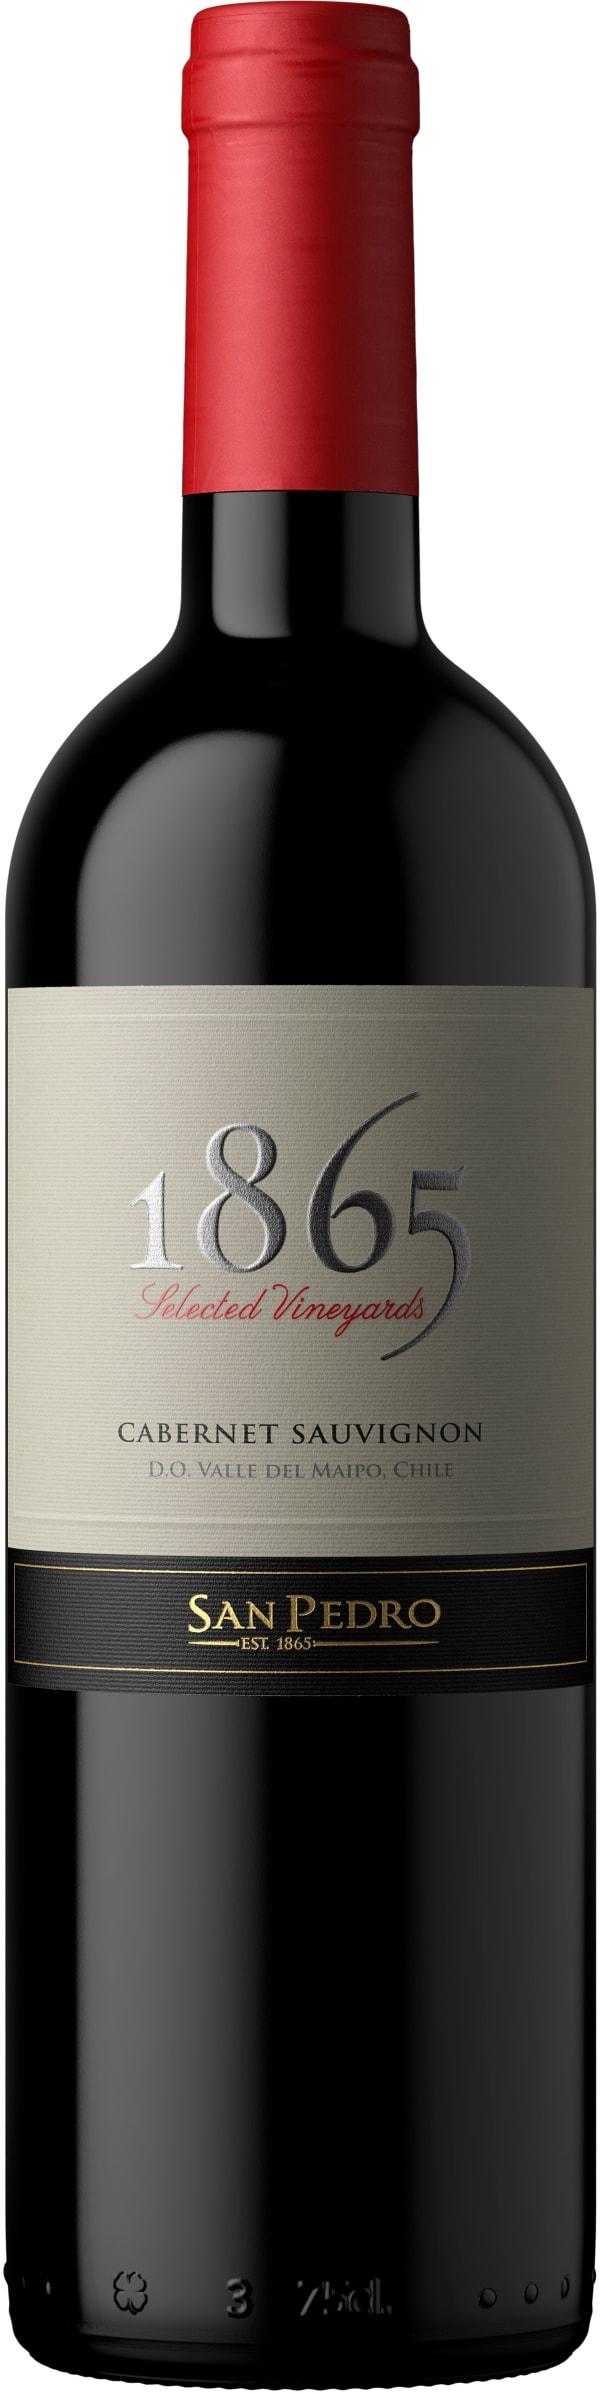 1865 Selected Vineyards Cabernet Sauvignon 2016